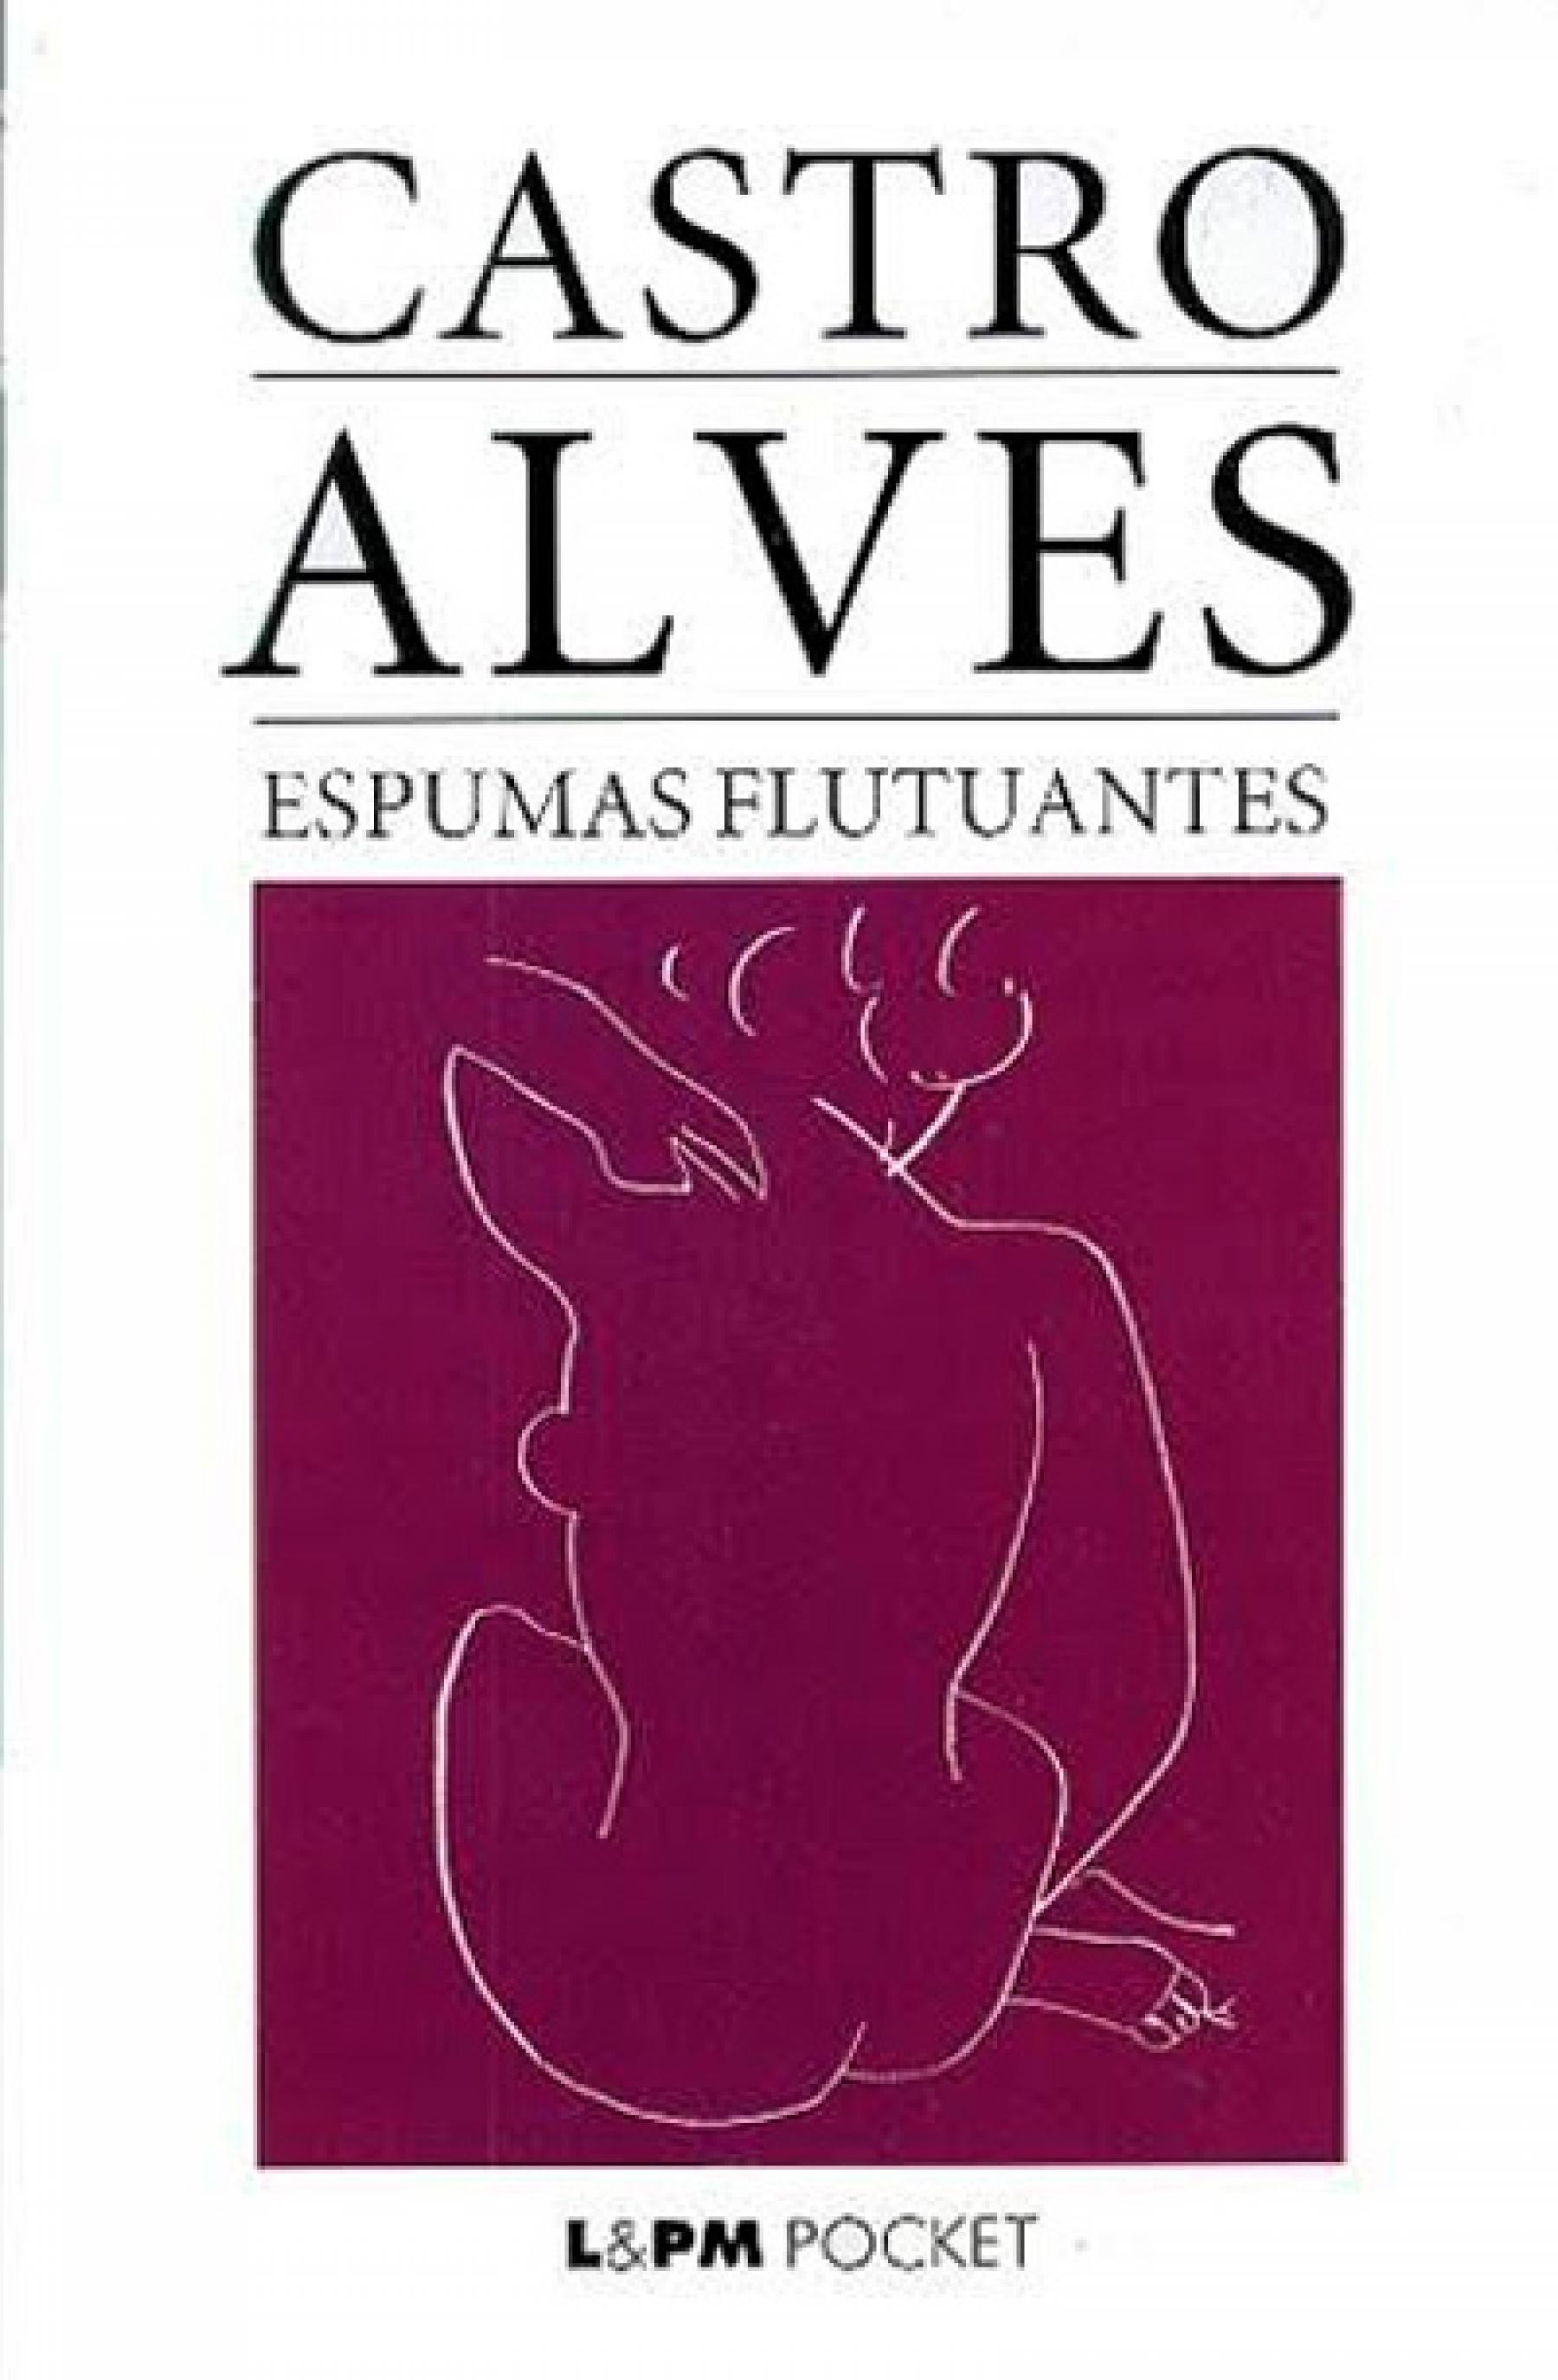 Castro Alves